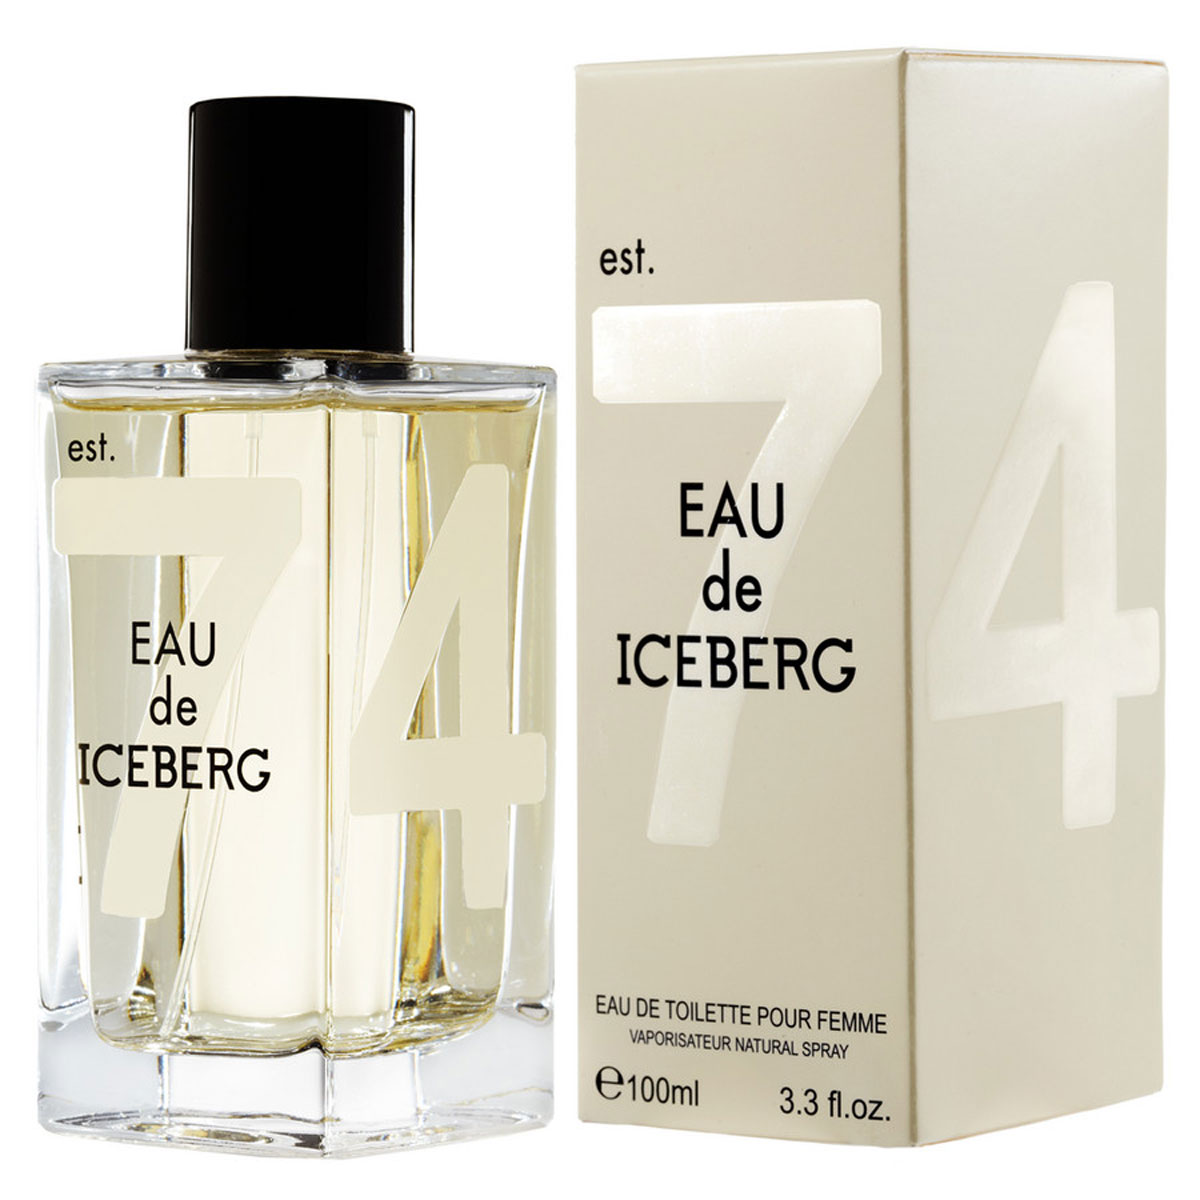 Iceberg Eau de Iceberg Classic Туалетная вода женская, 100 мл iceberg universe туалетная вода 50 мл